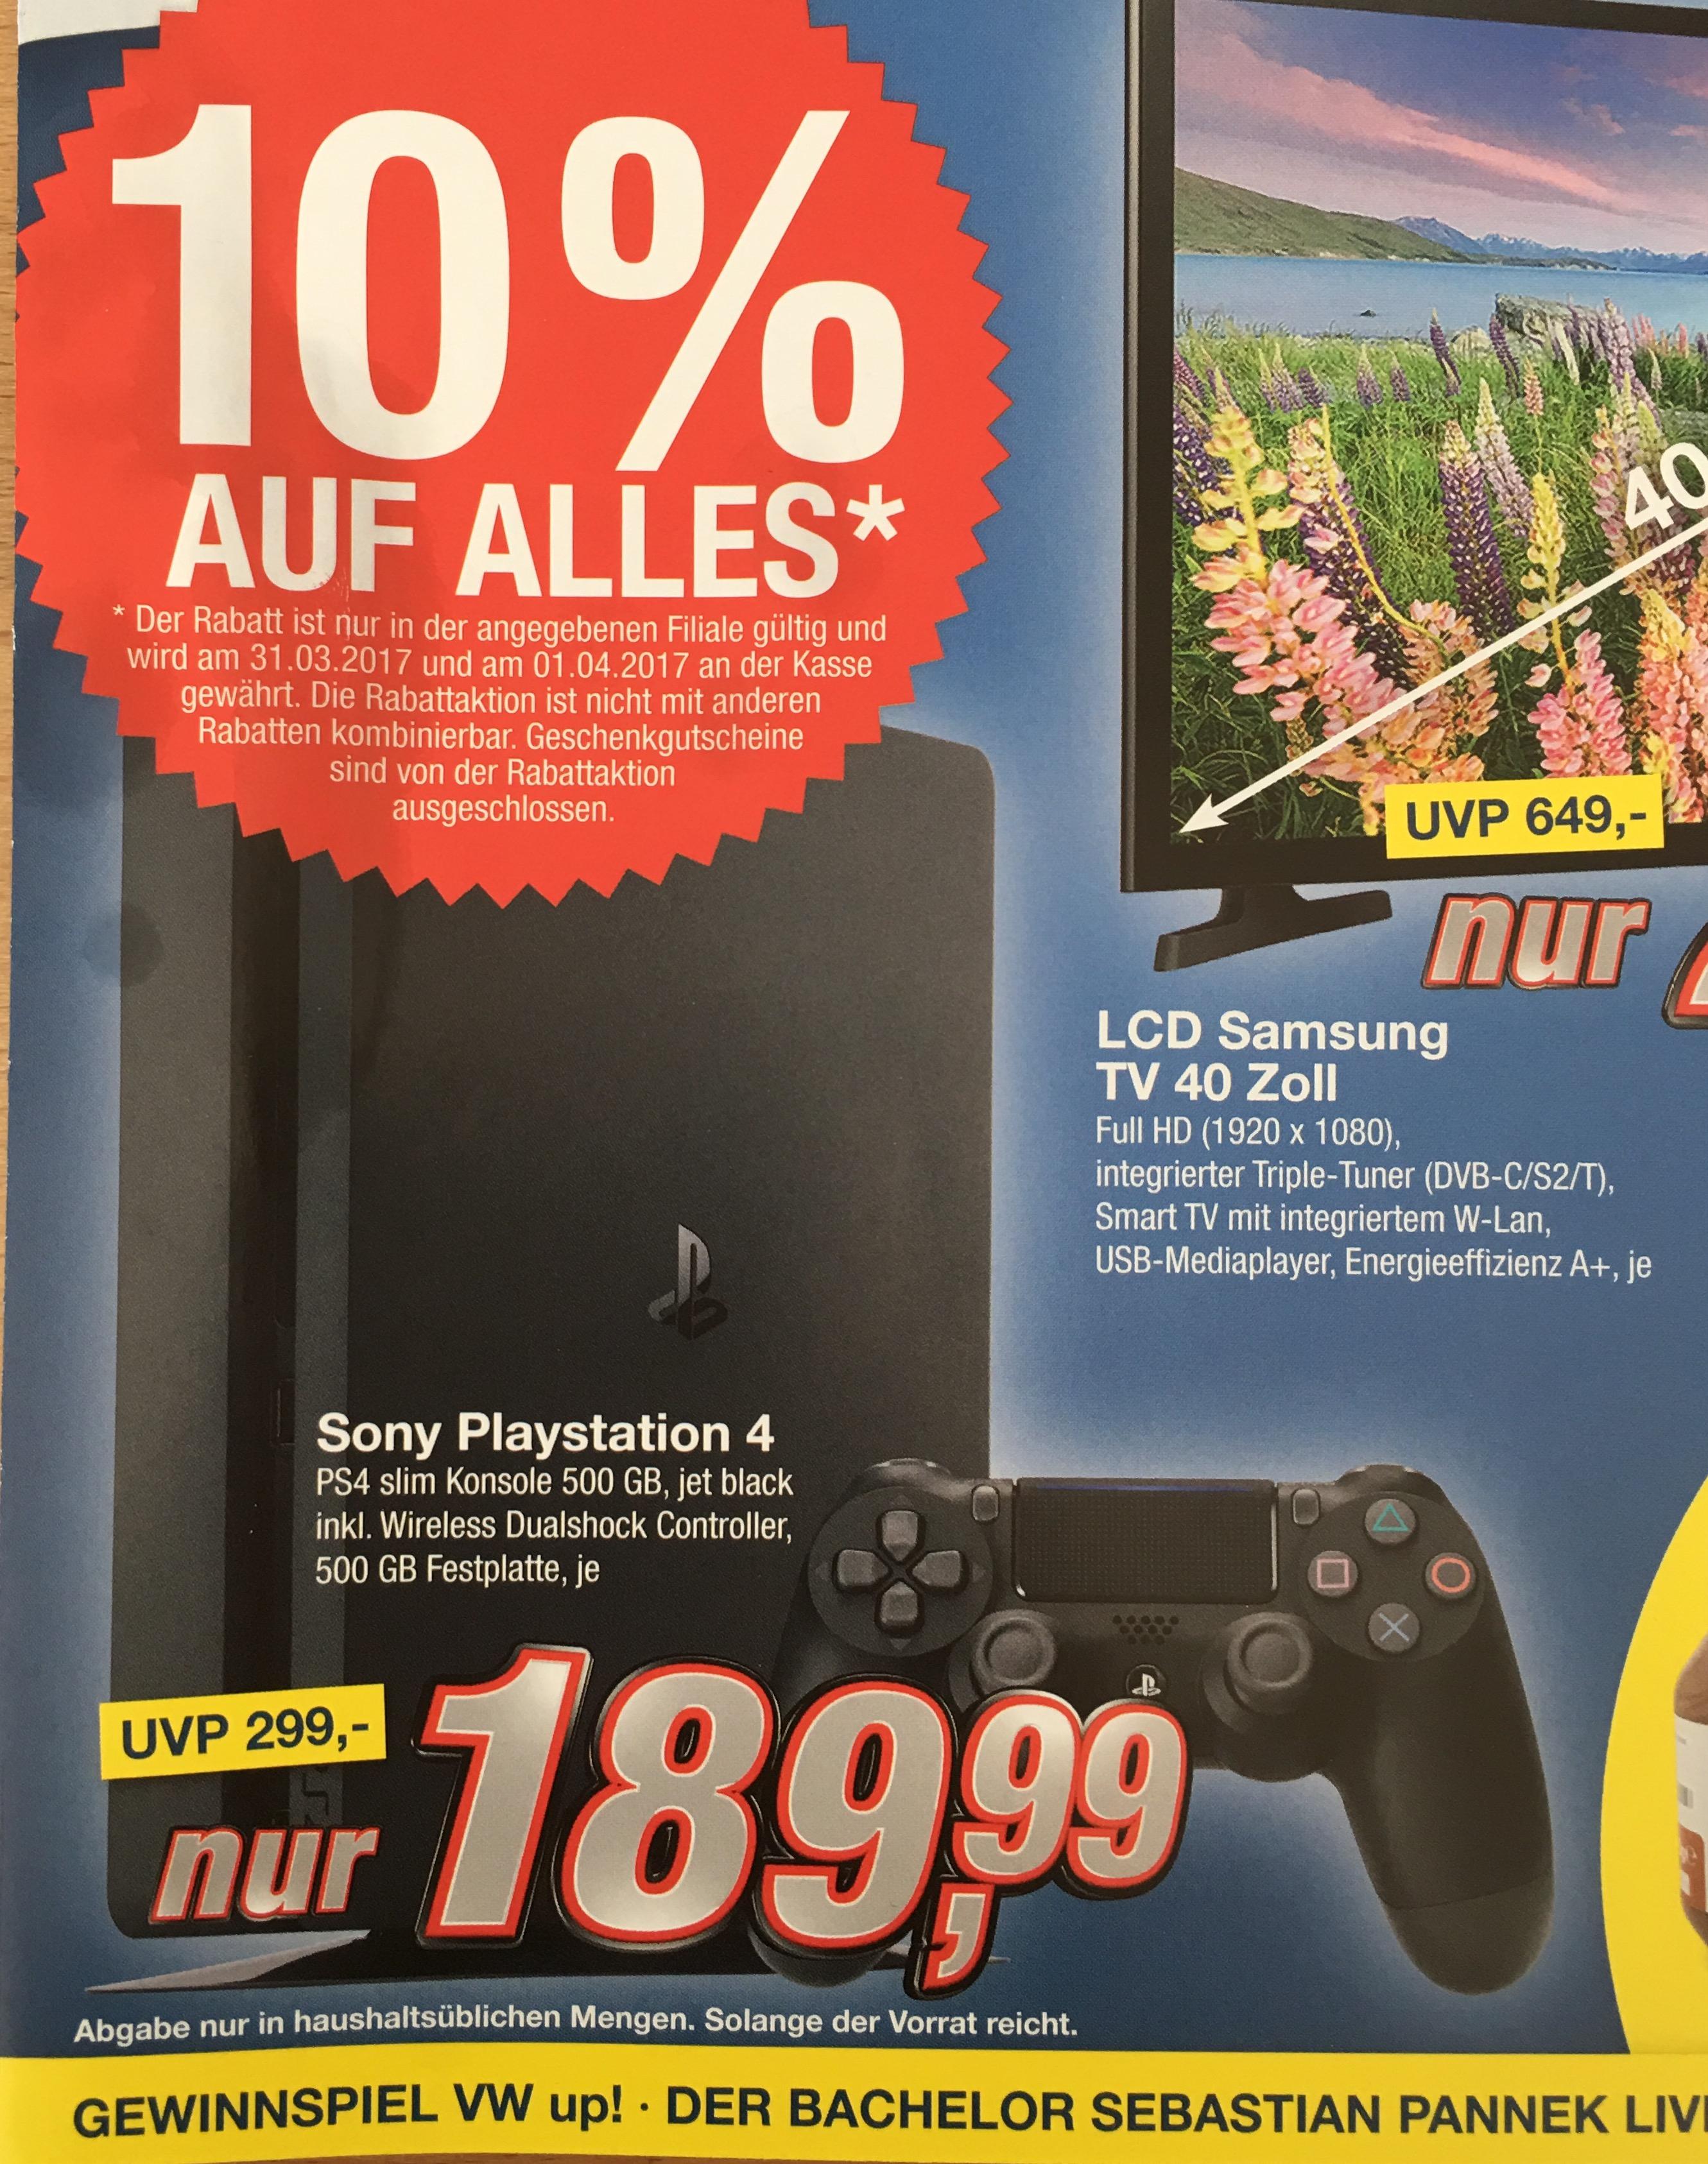 UPDATE[Lokal Bielefeld Sieker kik] Sony Playstation 4 Slim 500 GB, jet black, inkl. Controller ab 31.03. und 1.4.